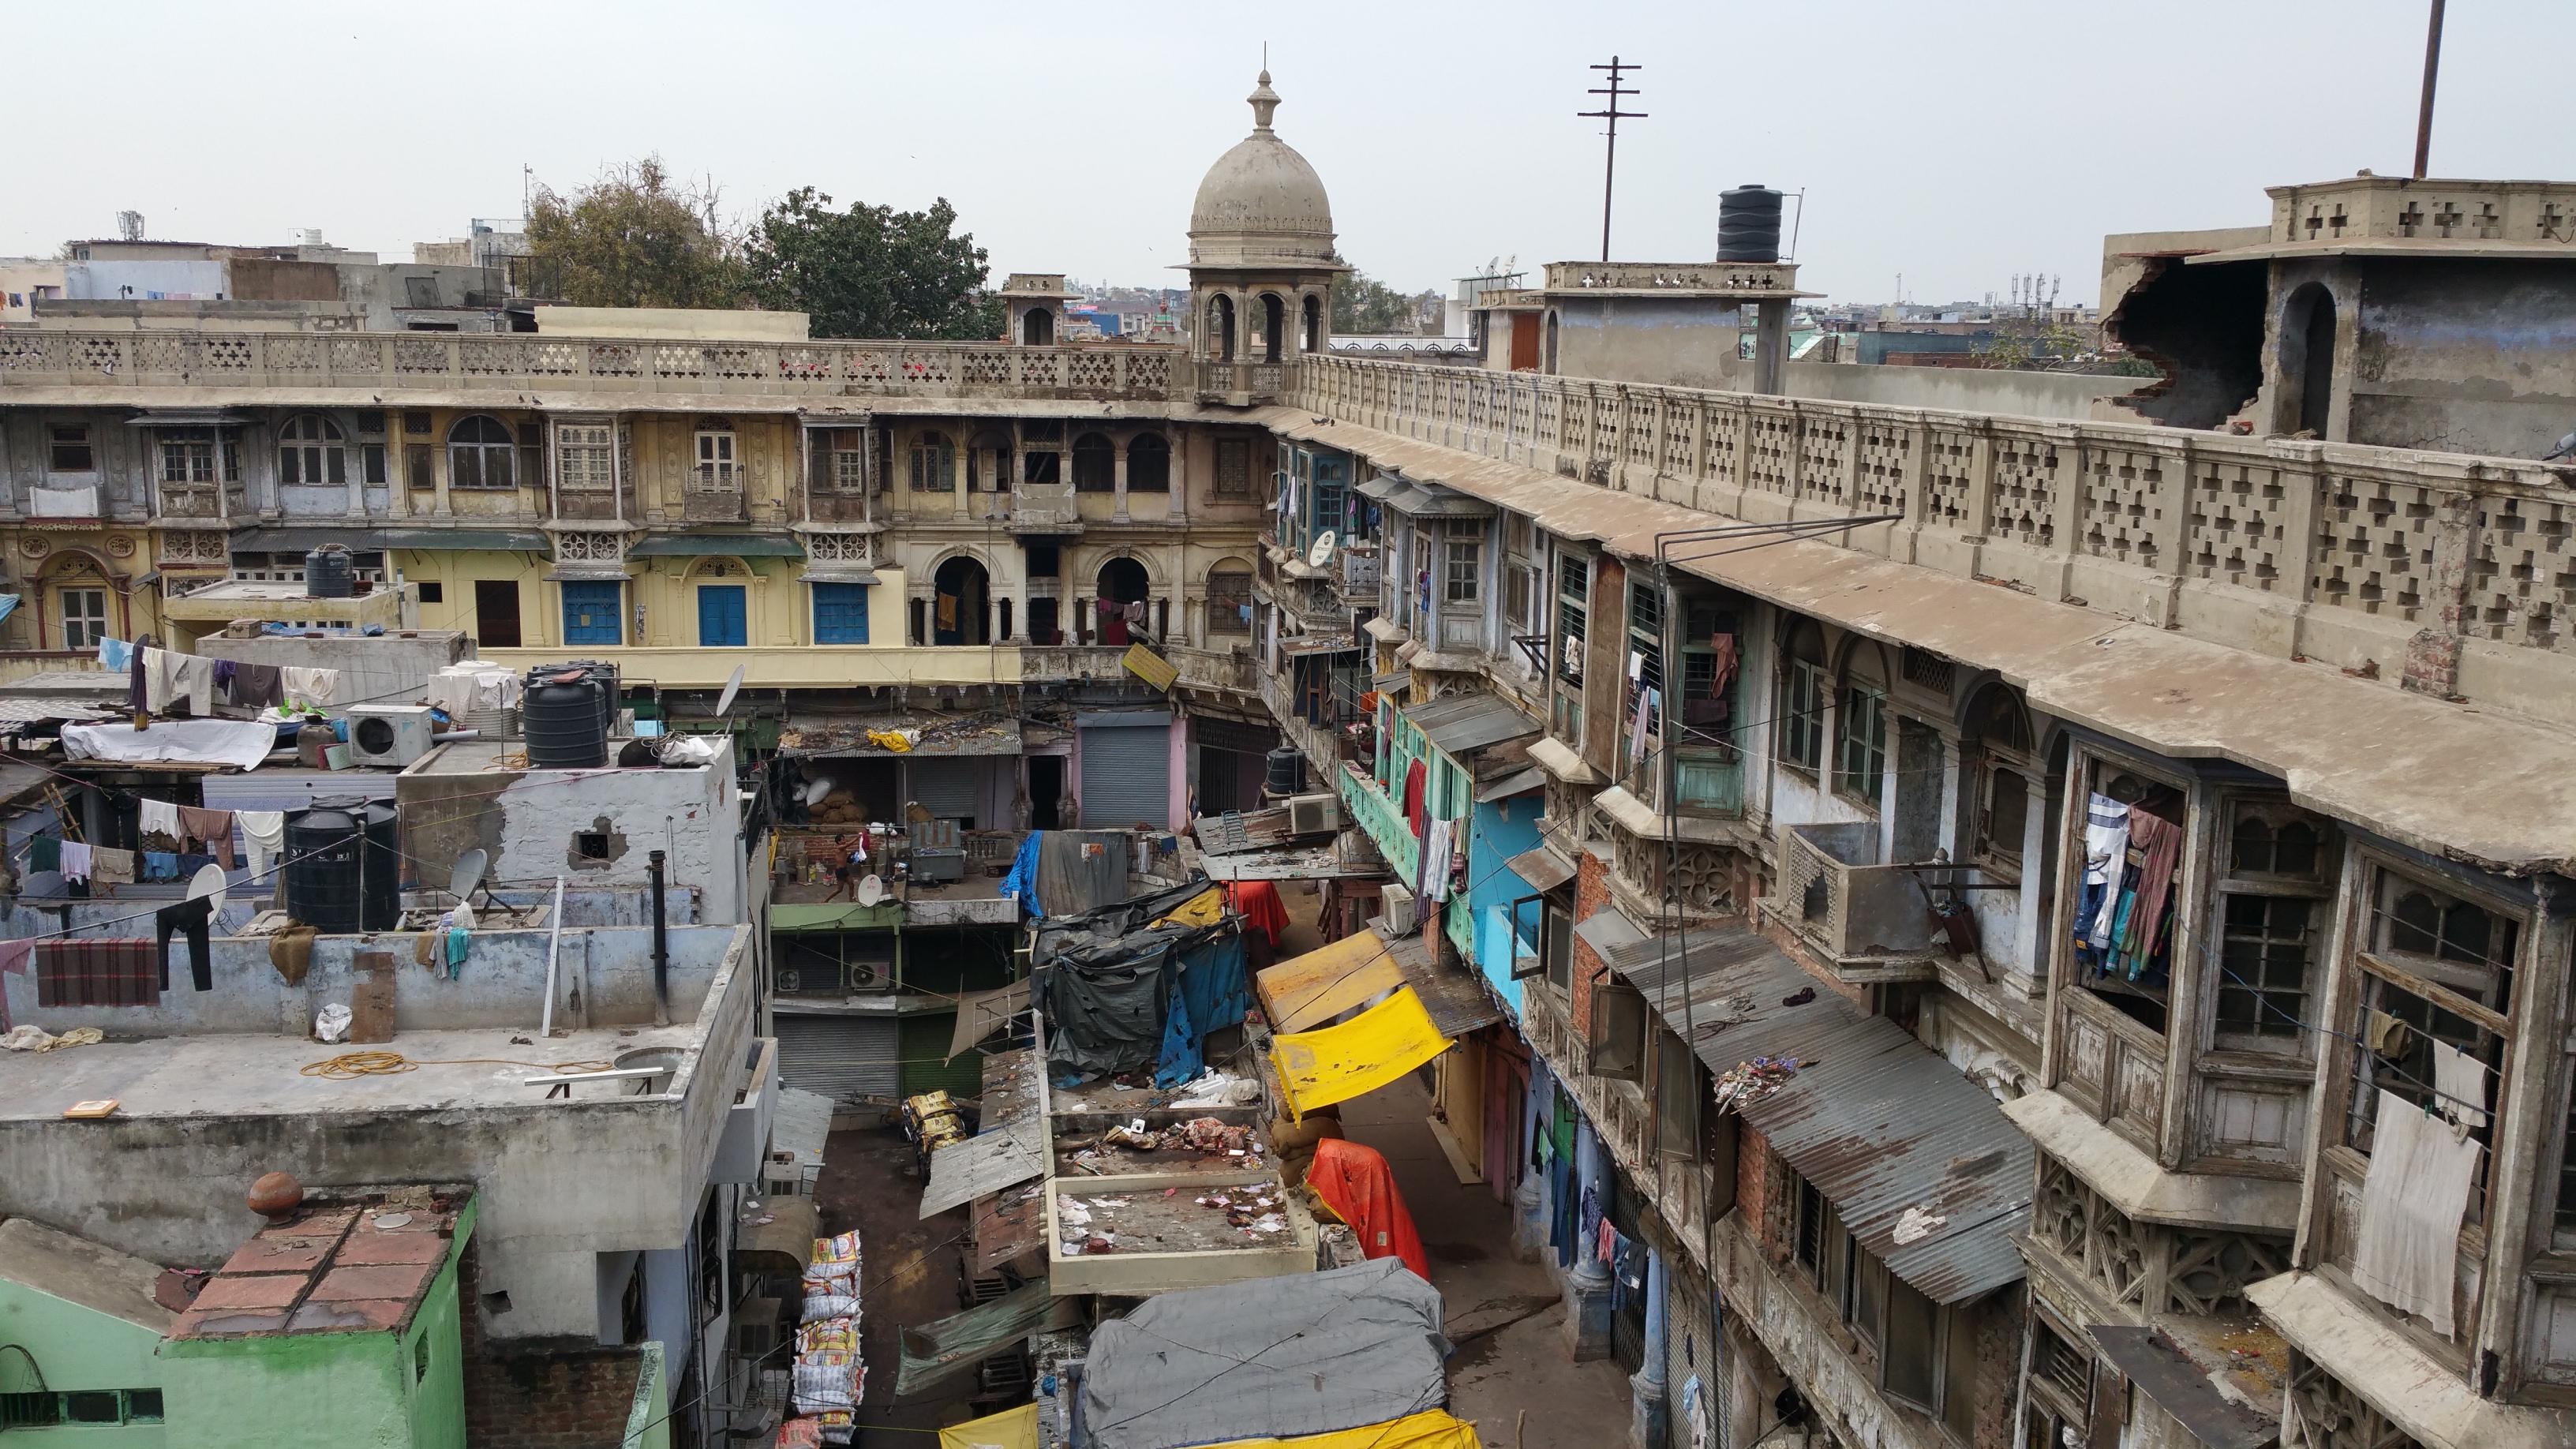 Poor part of New Dehli, India.